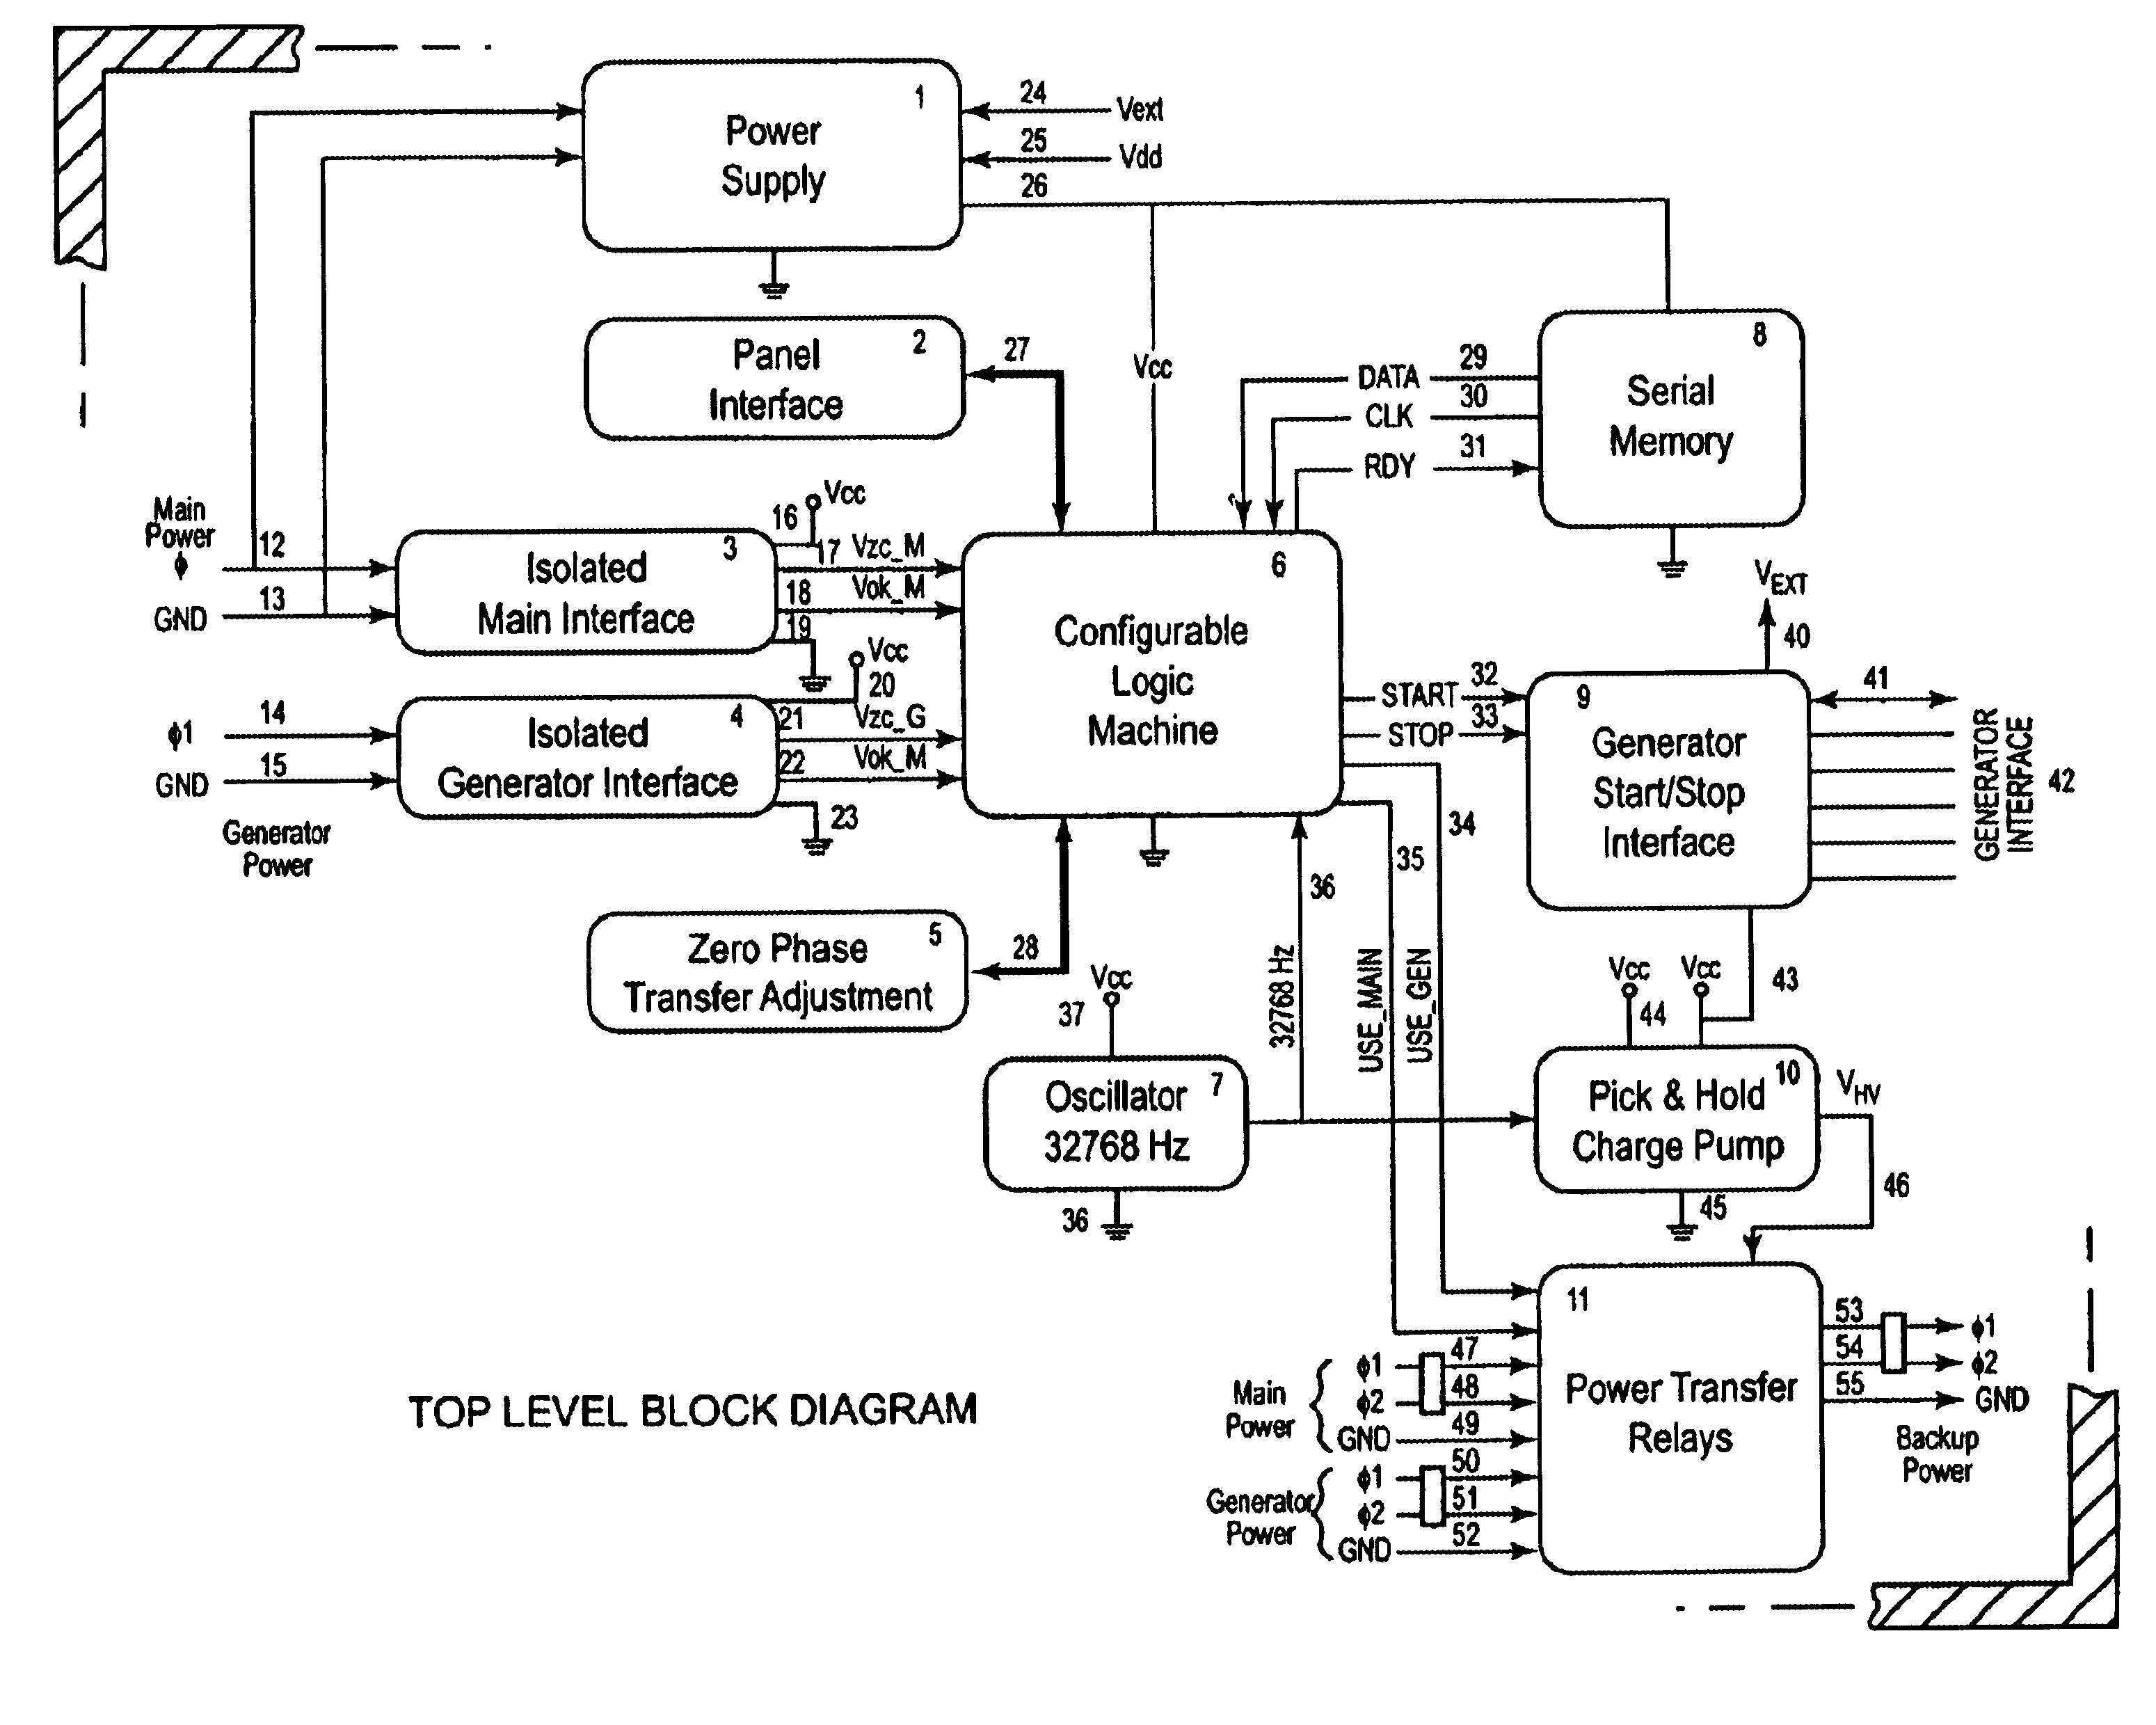 Asco 300 Wiring Diagram